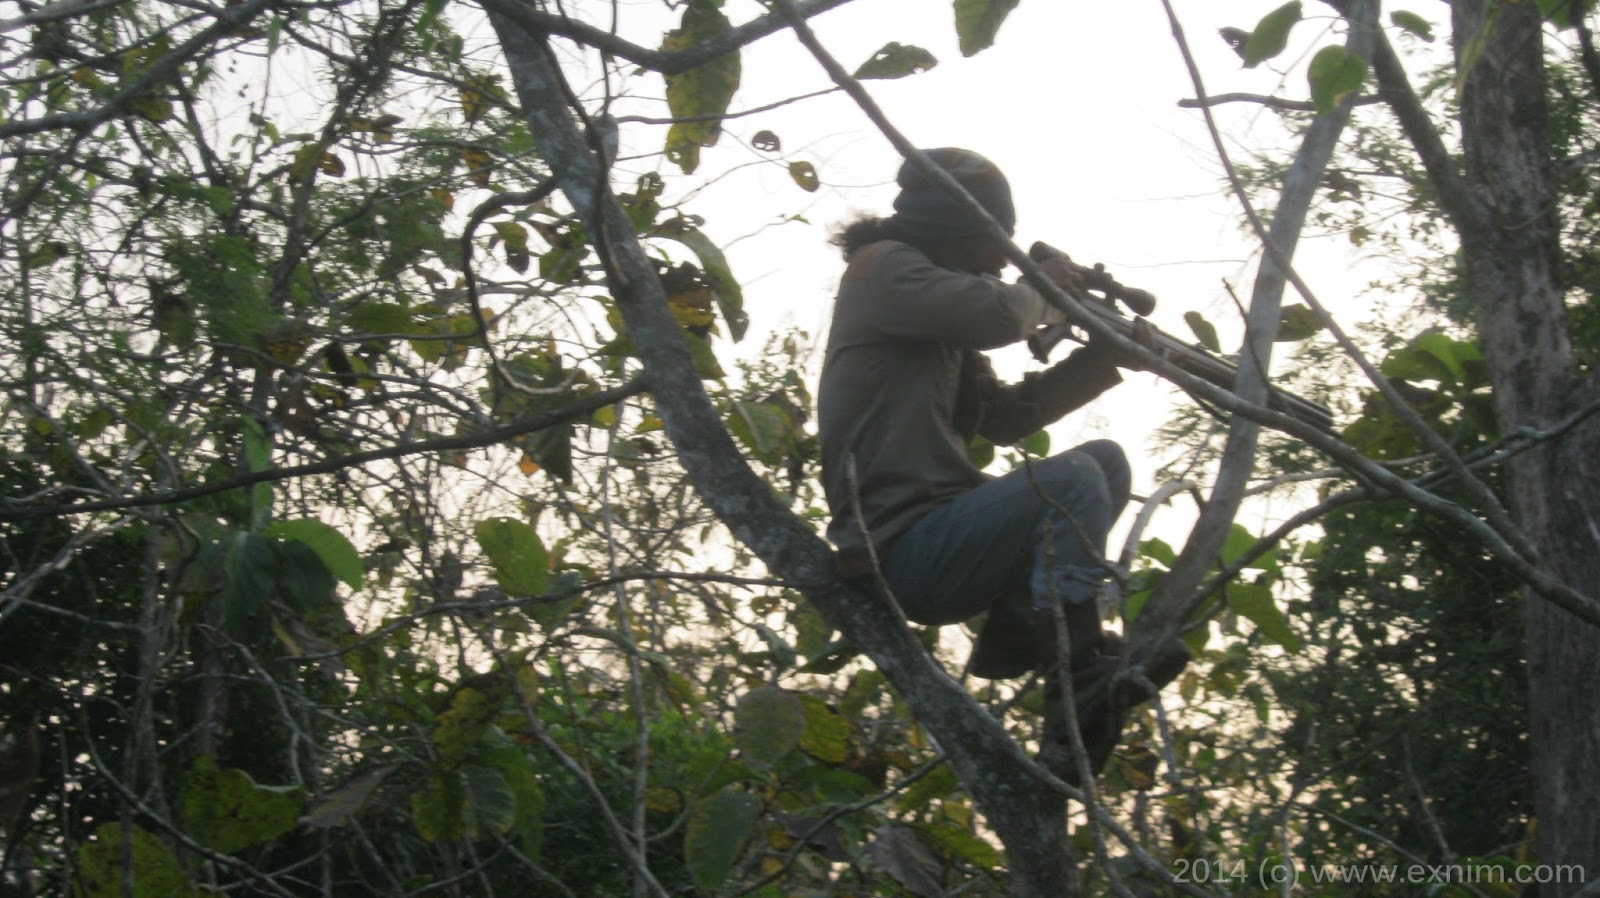 Salah seorang pemburu sedang membidik sasaran